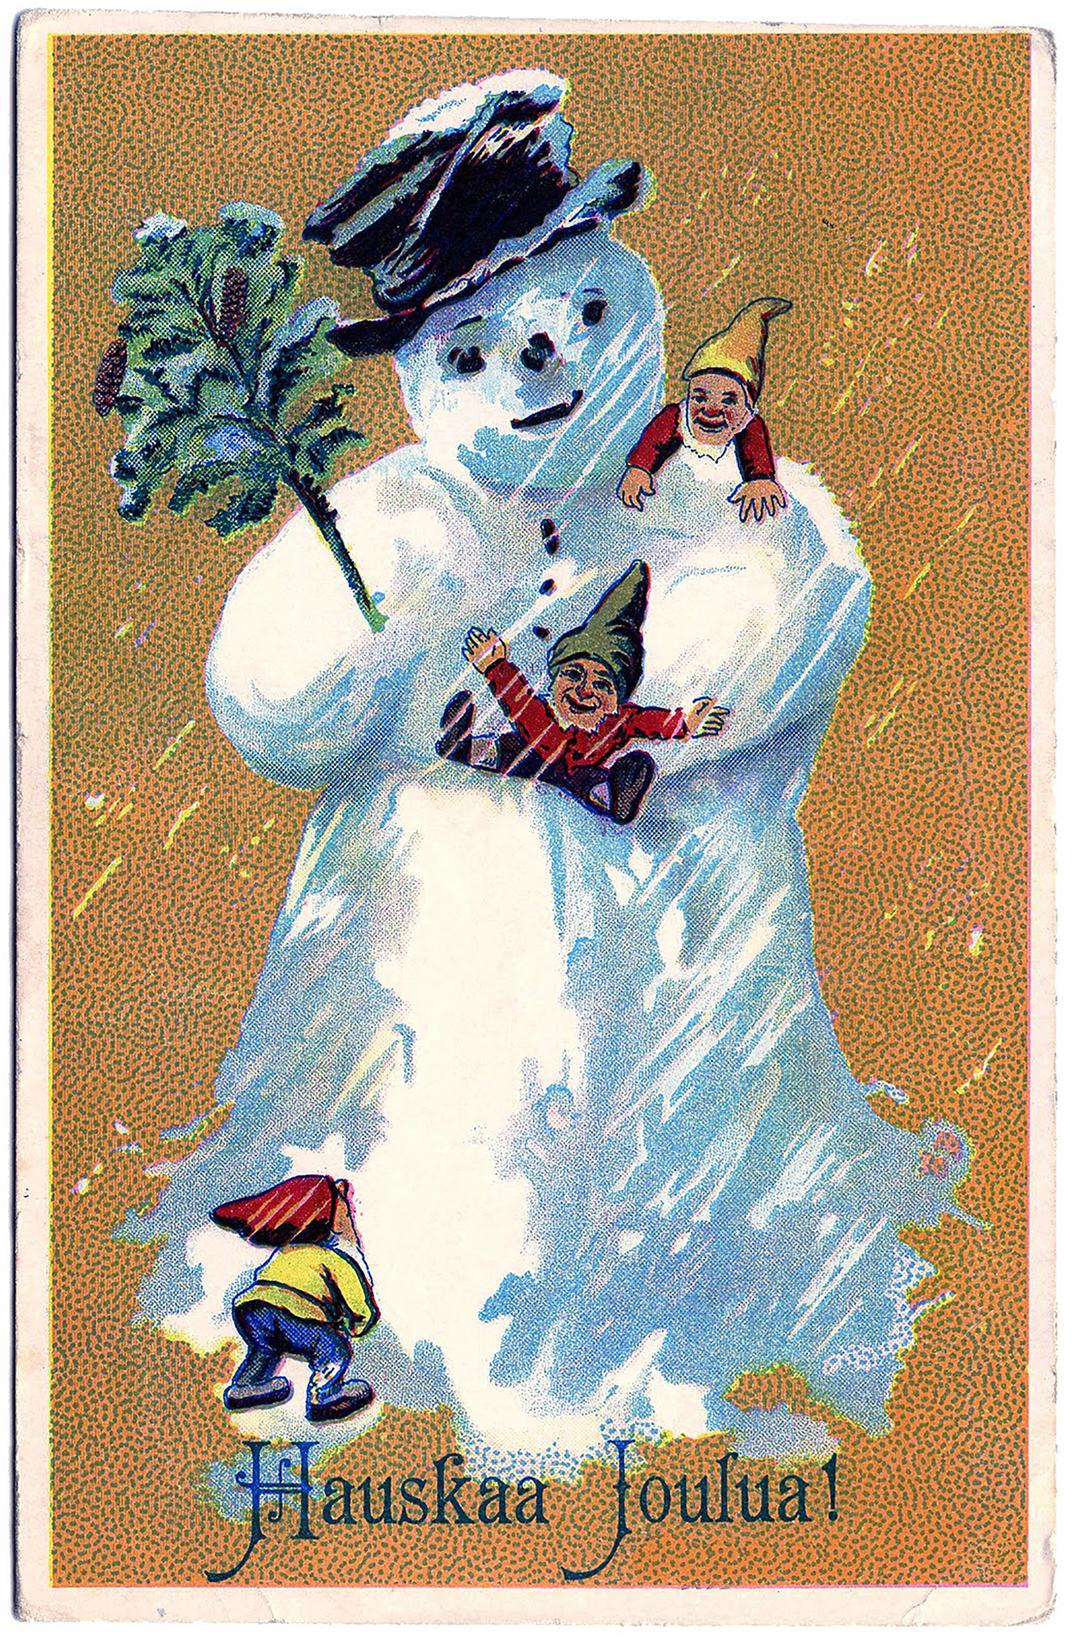 15 Best Snowman Images! - The Graphics Fairy